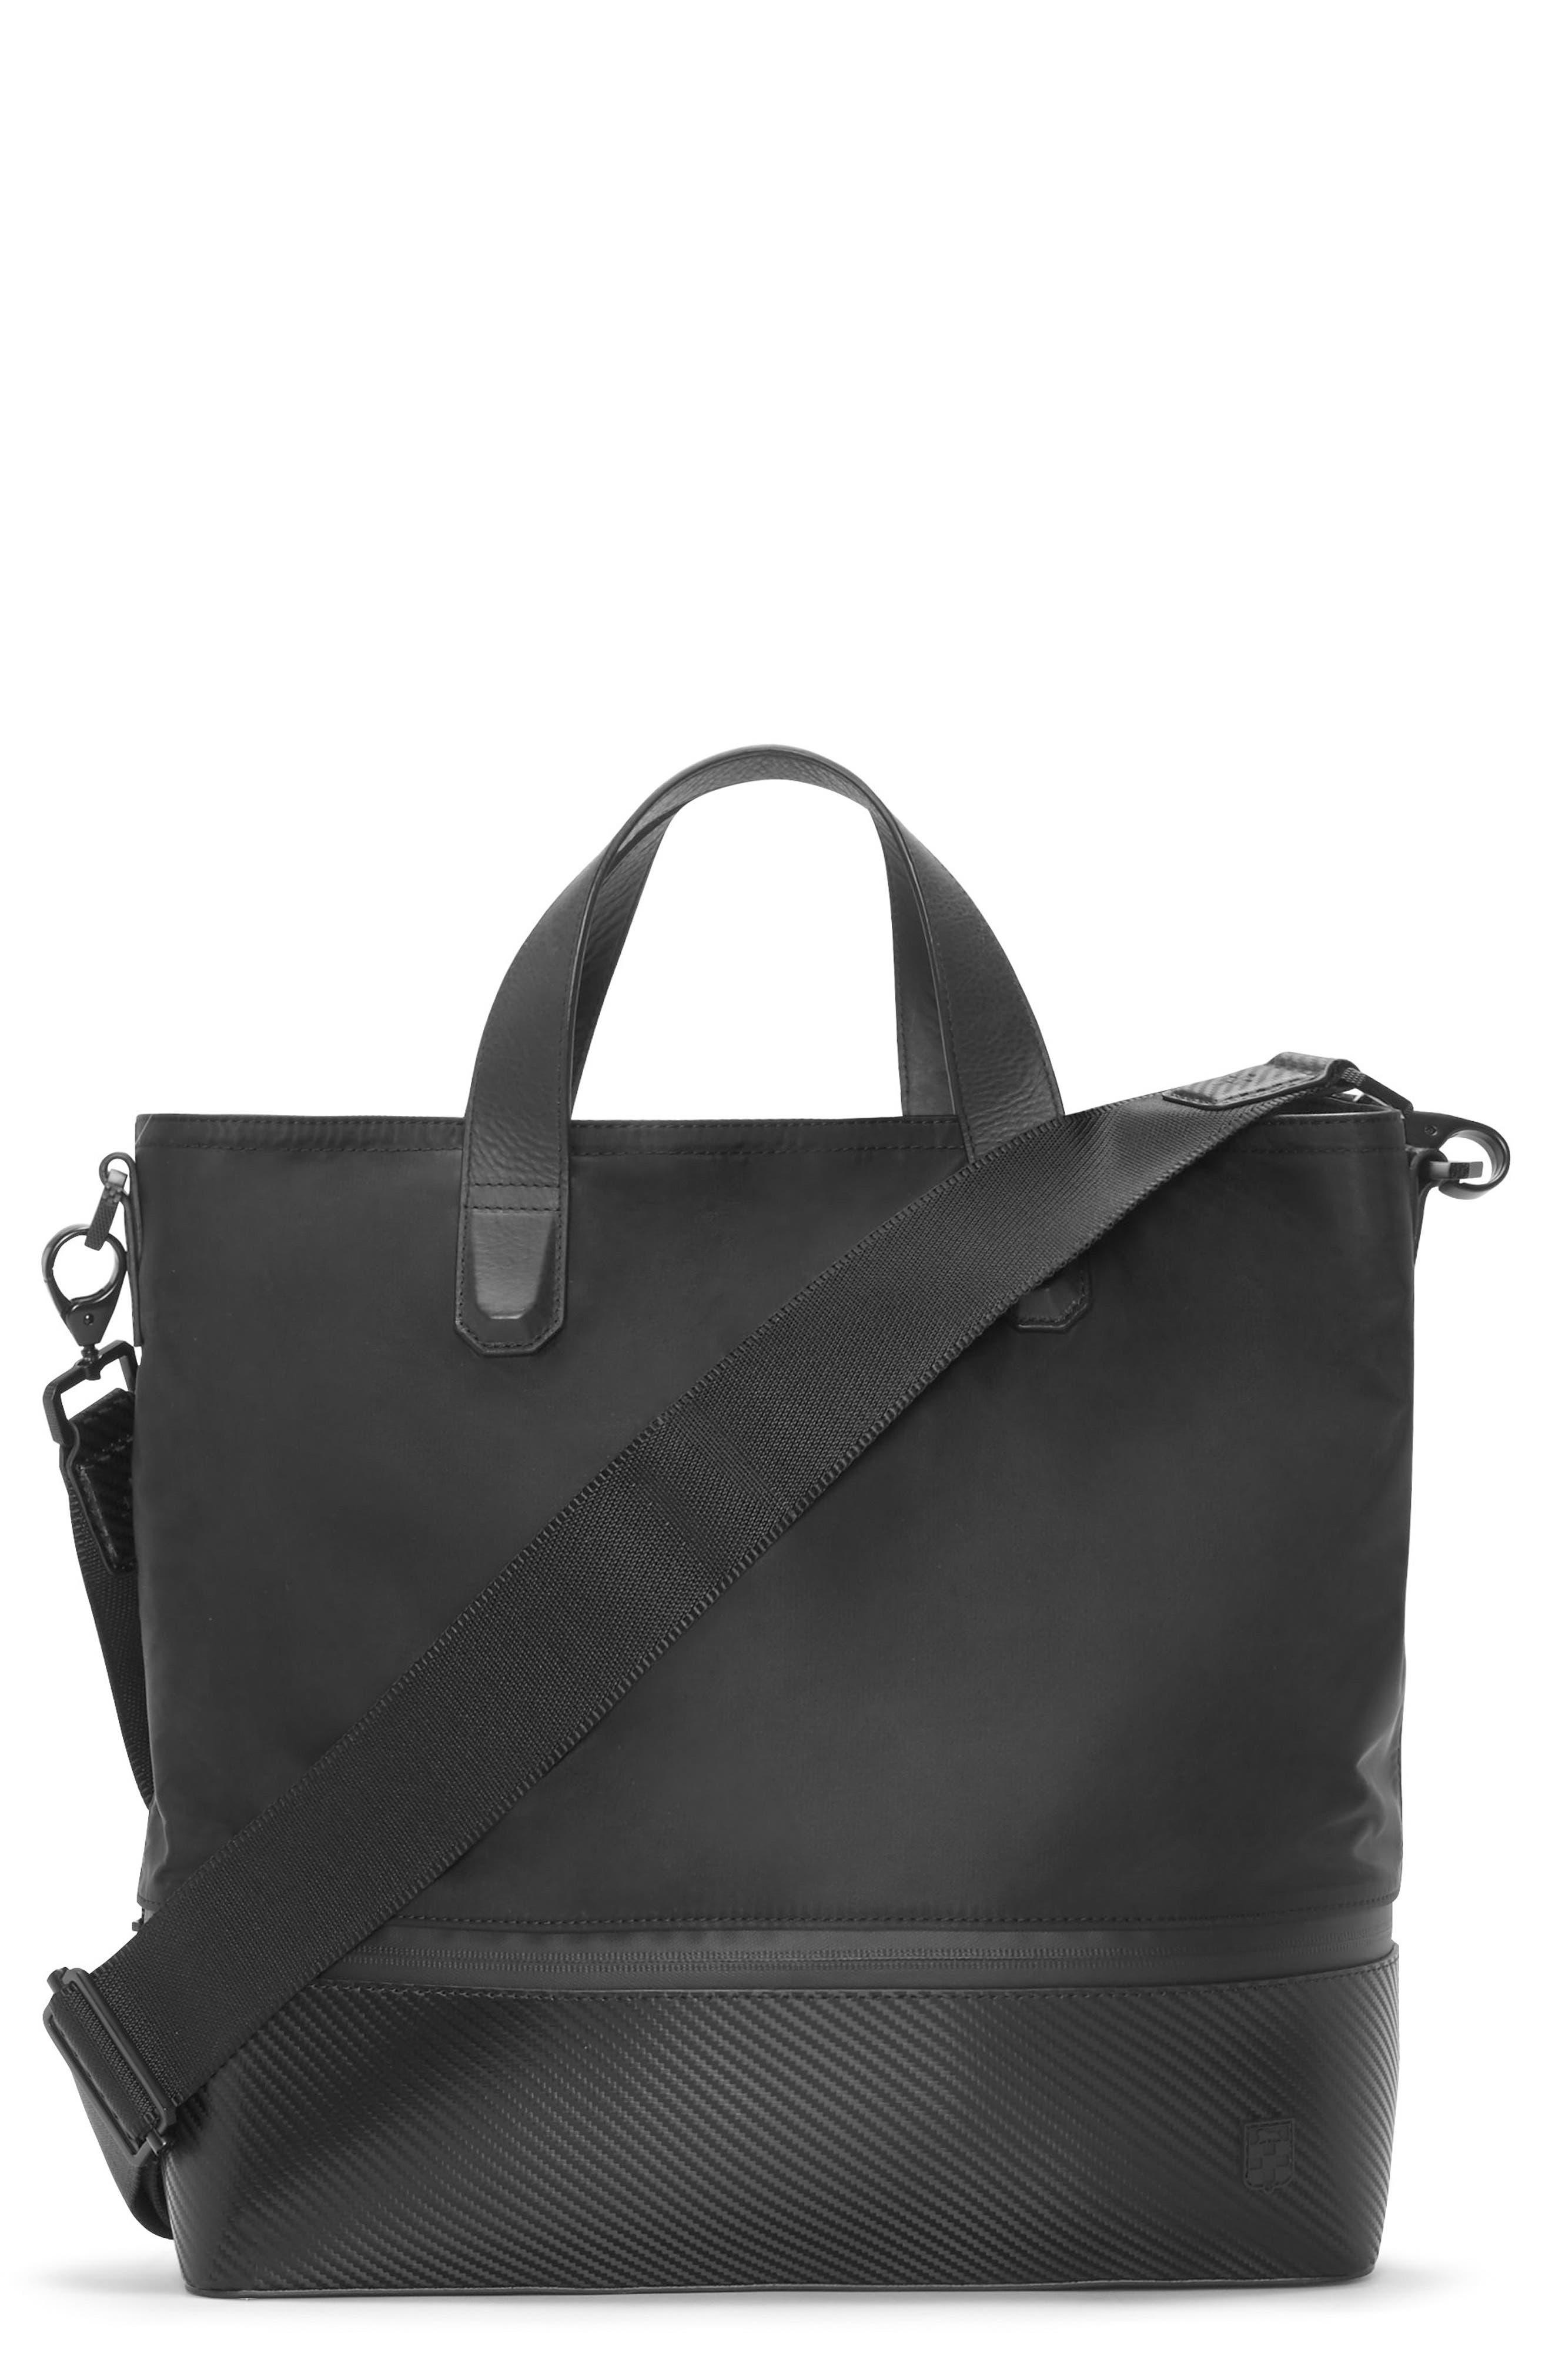 Lupe Tote Bag,                             Main thumbnail 1, color,                             002